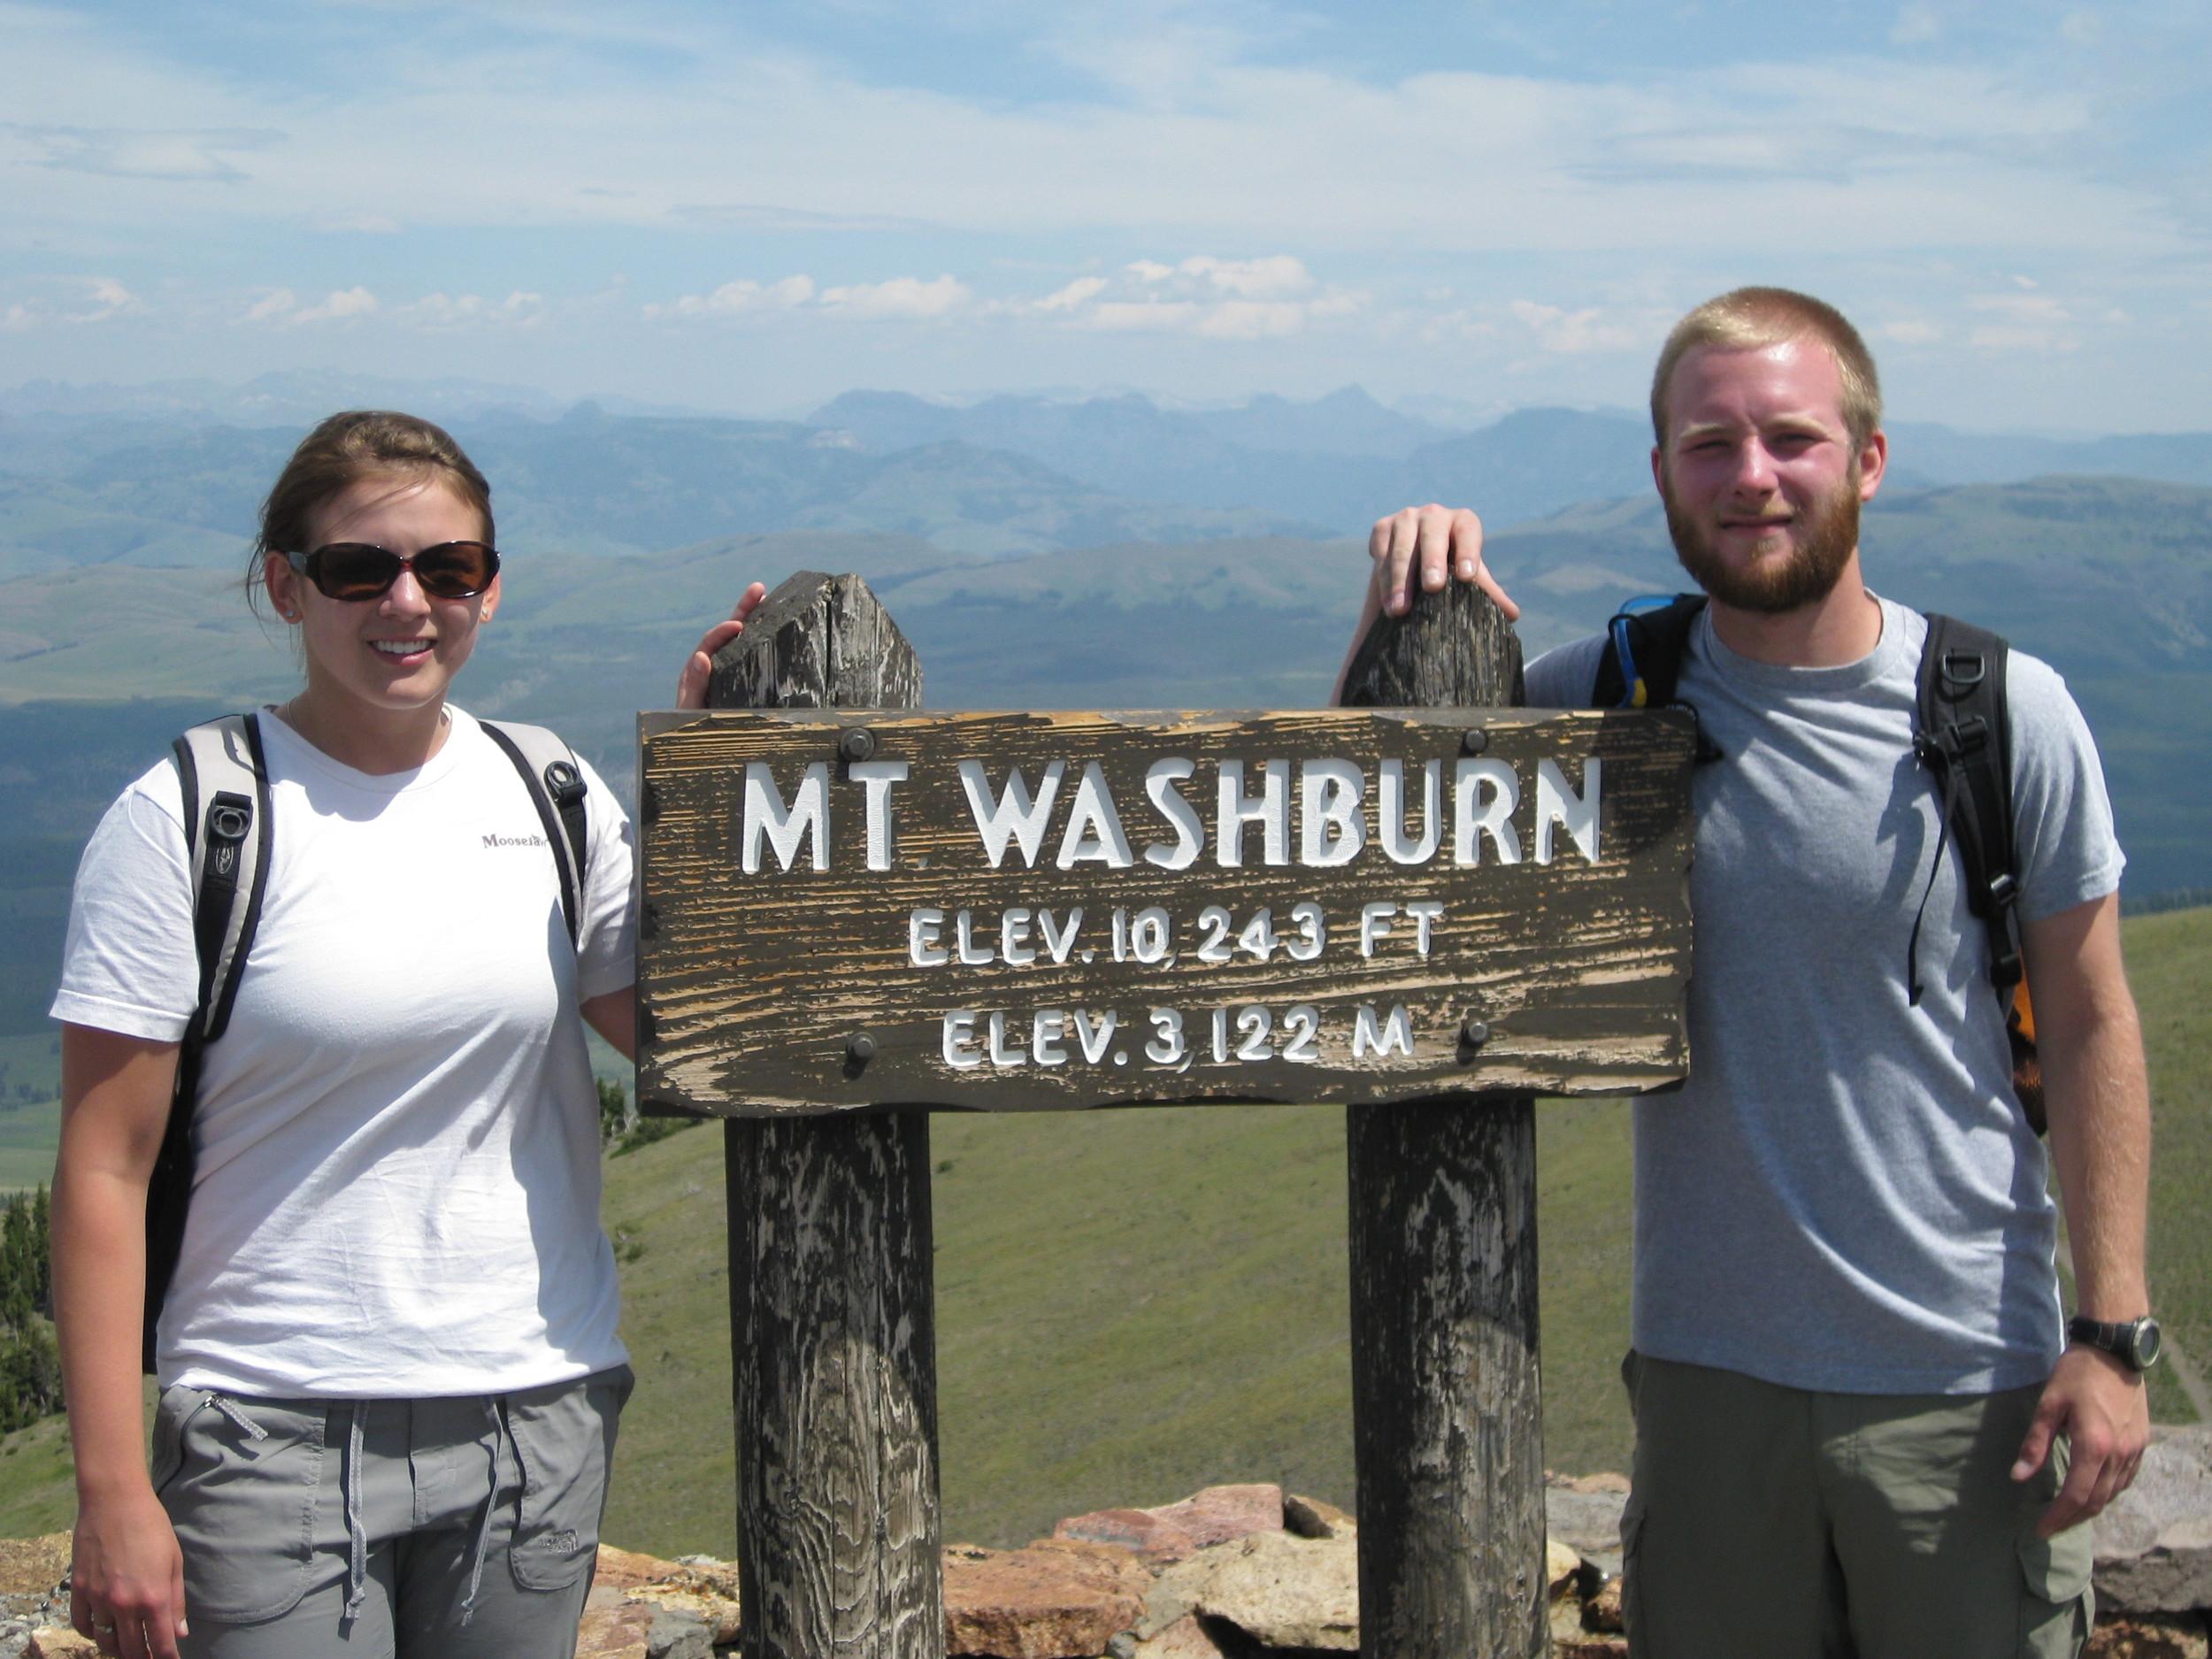 Atop Mount Washburn